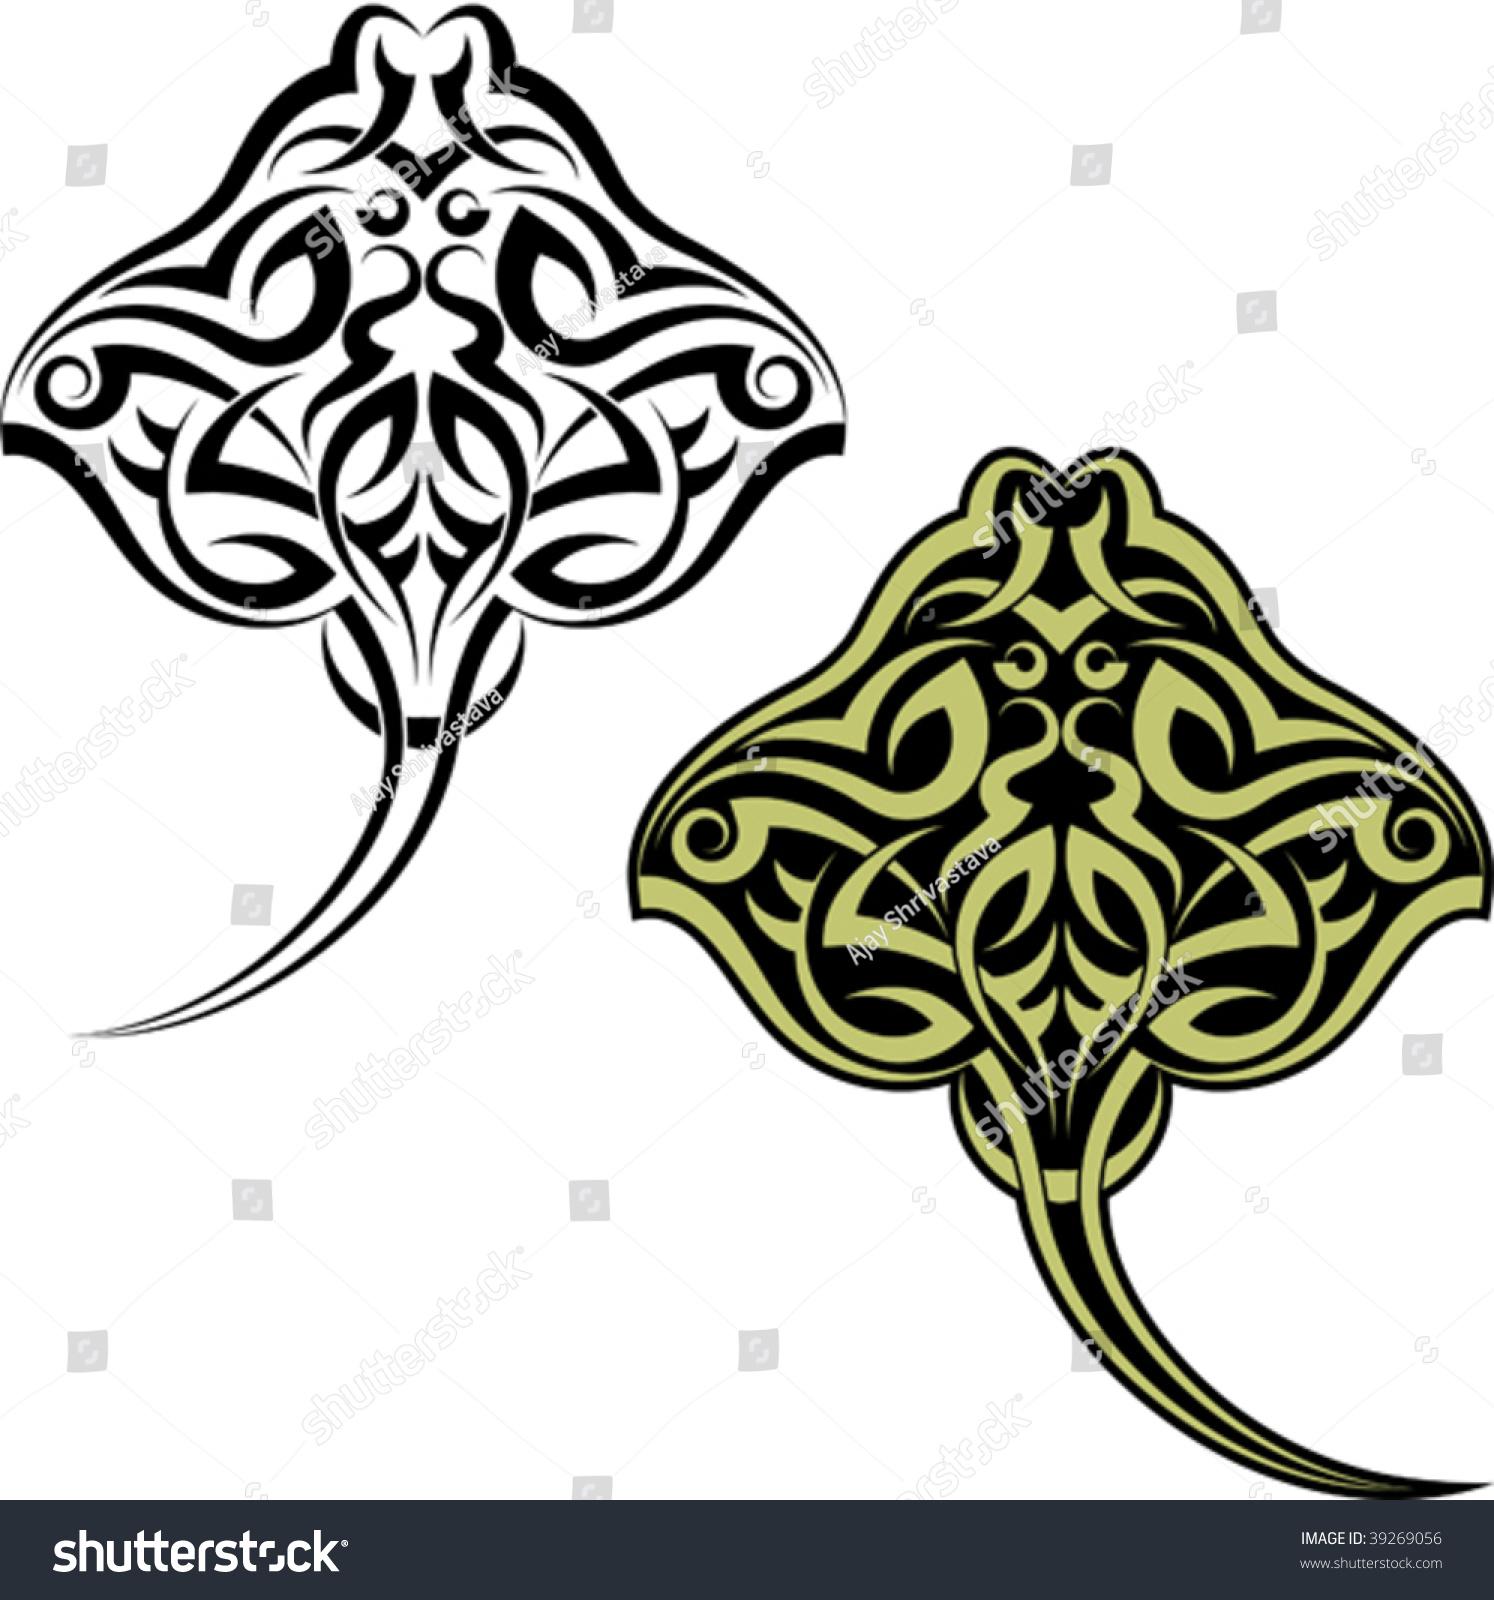 Maori Fish Tattoo: Tattoo Maori Stingray Fish Stock Vector 39269056